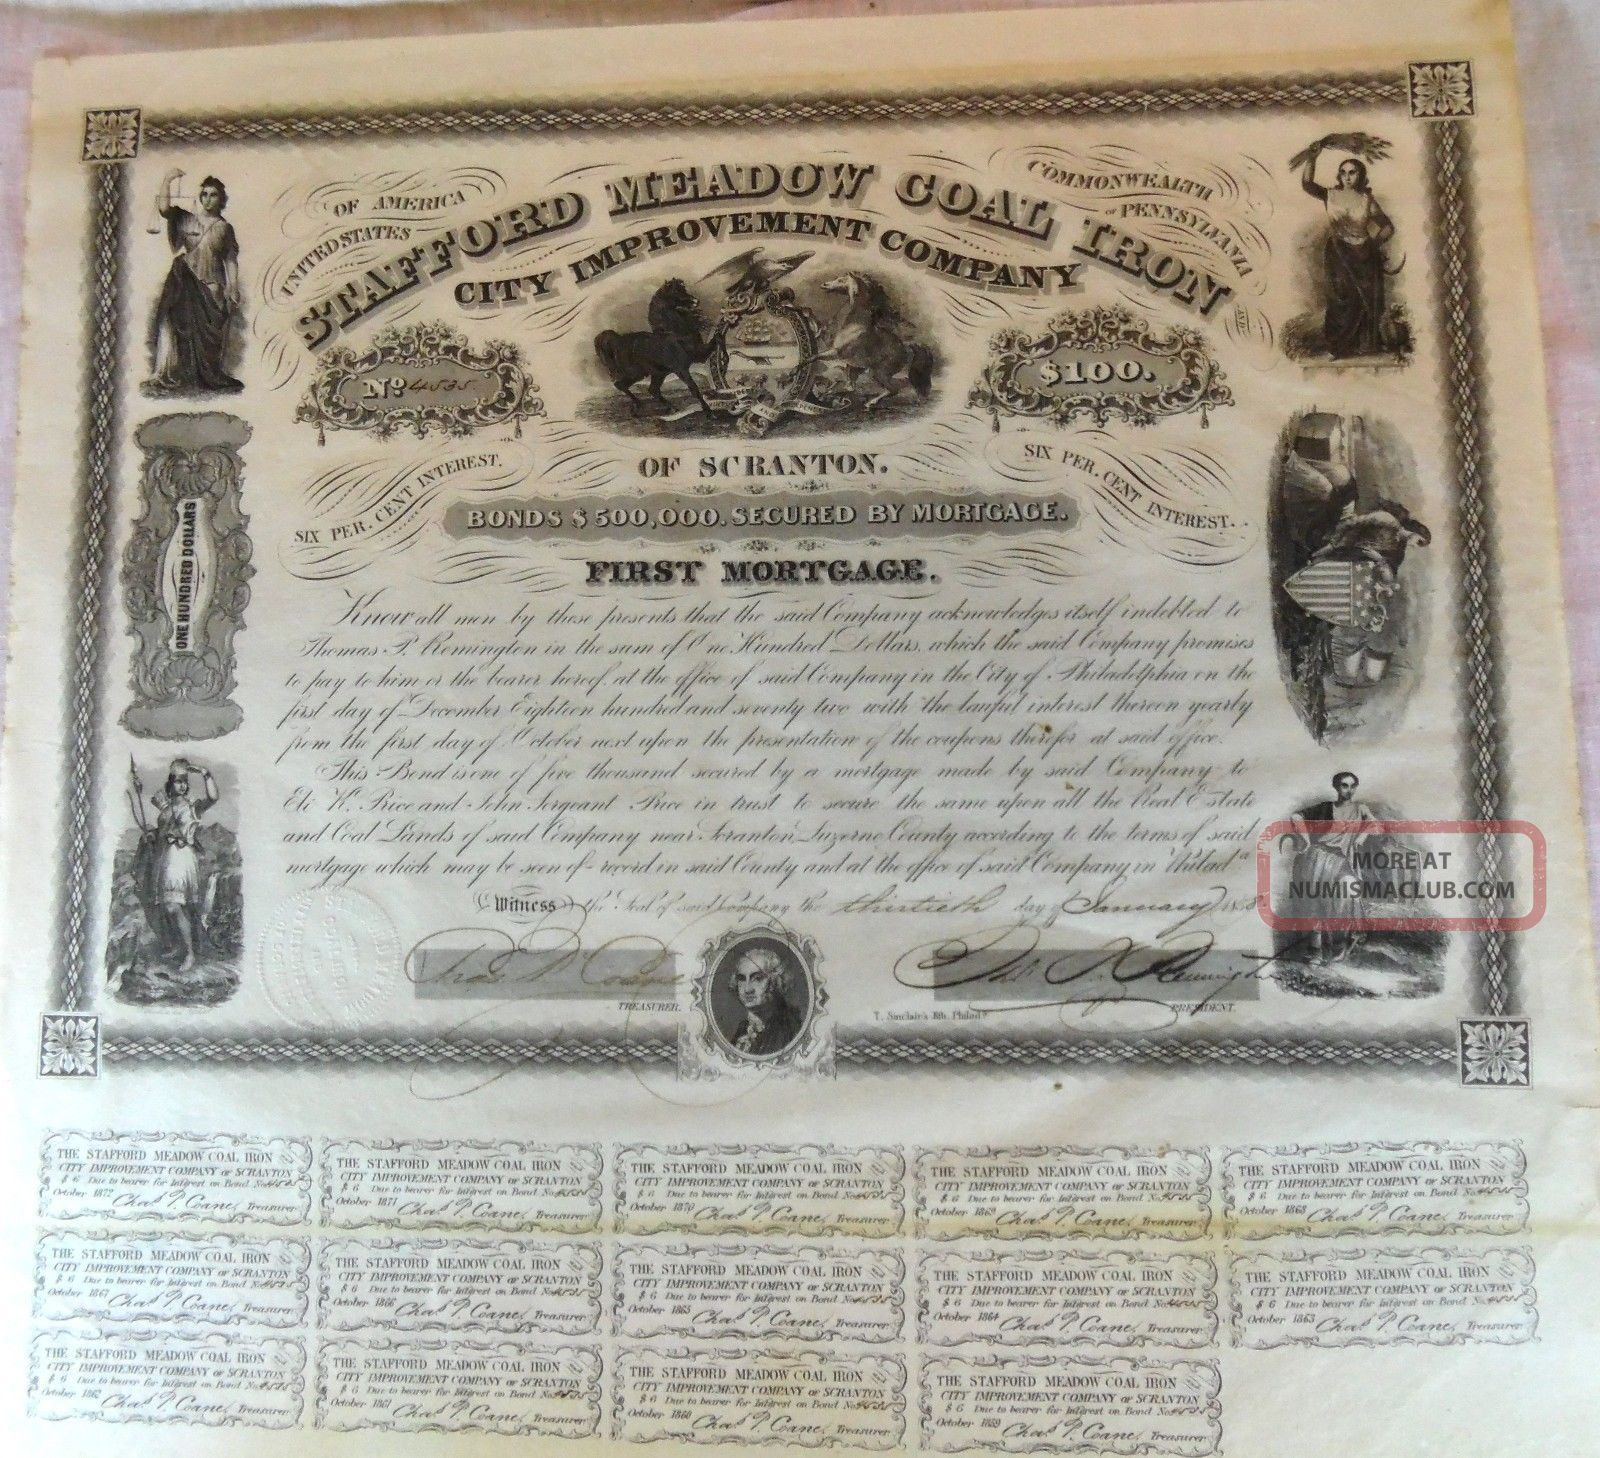 1858 Stafford Meadow Coal Iron Loan Bond Document Scranton Pa First Mortgage Stocks & Bonds, Scripophily photo